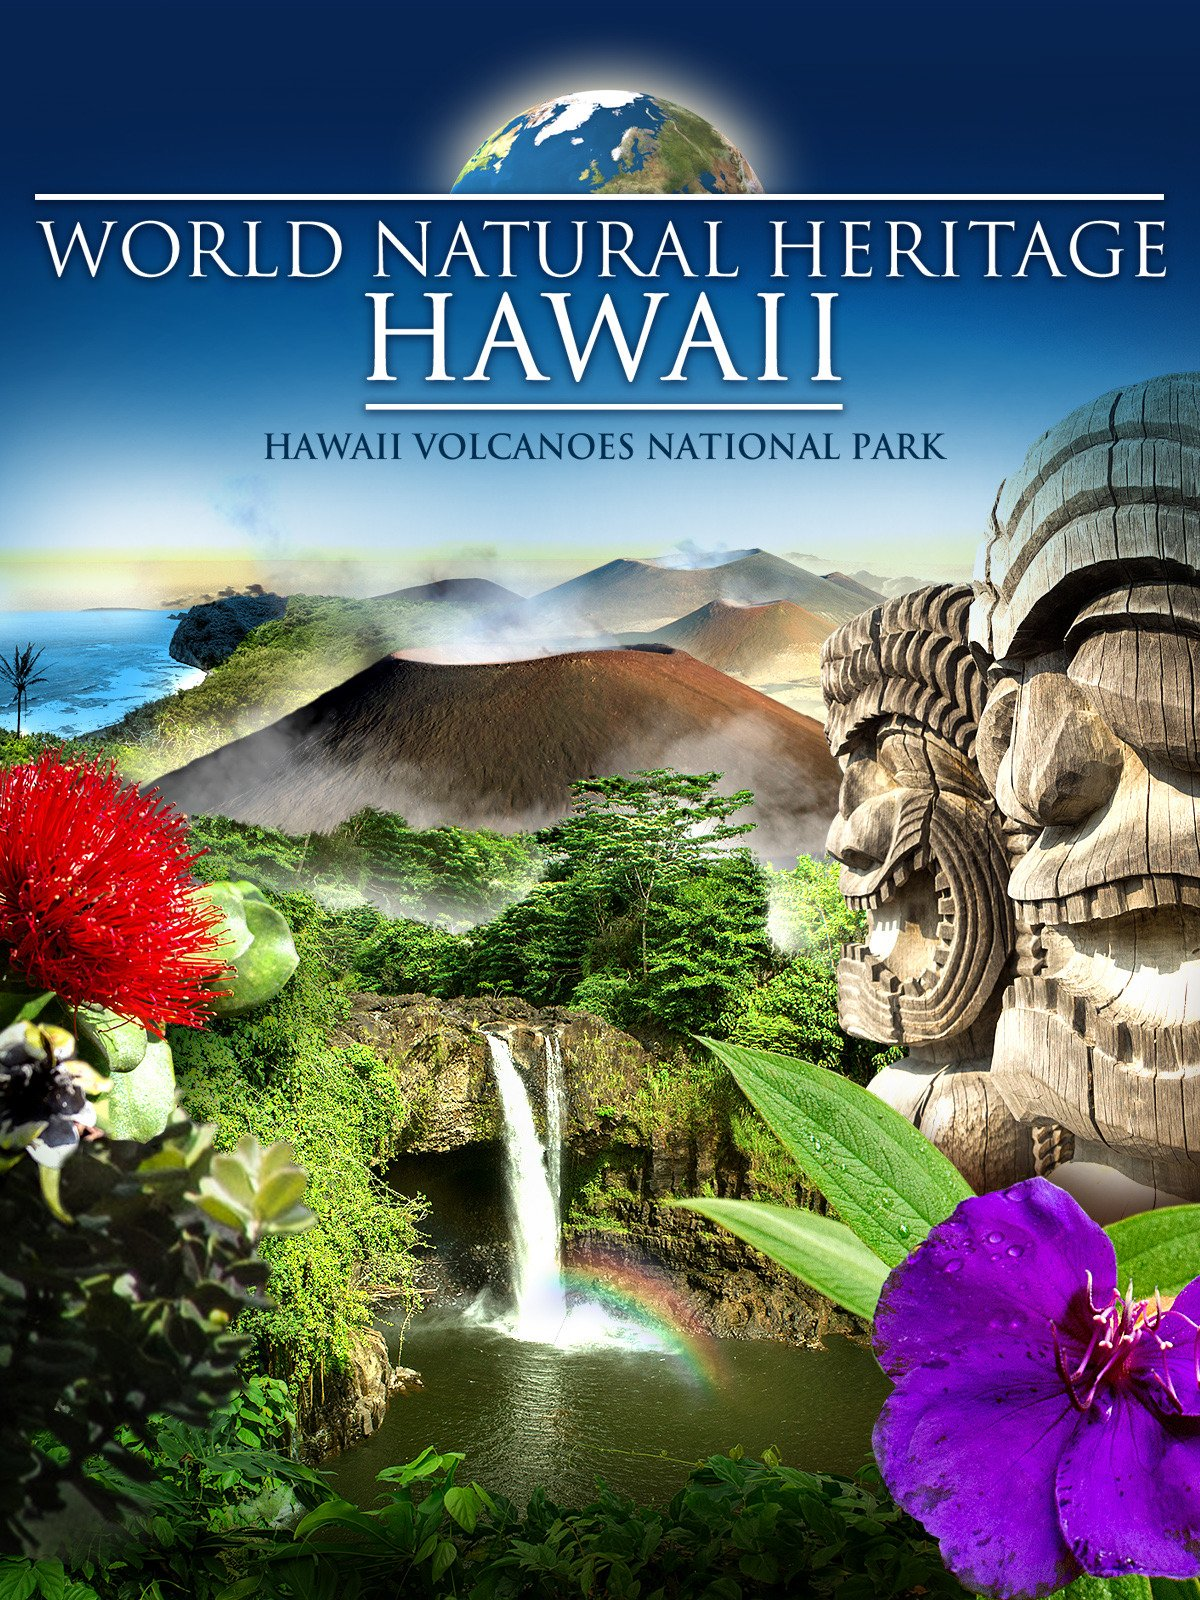 World Natural Heritage Hawaii on Amazon Prime Video UK